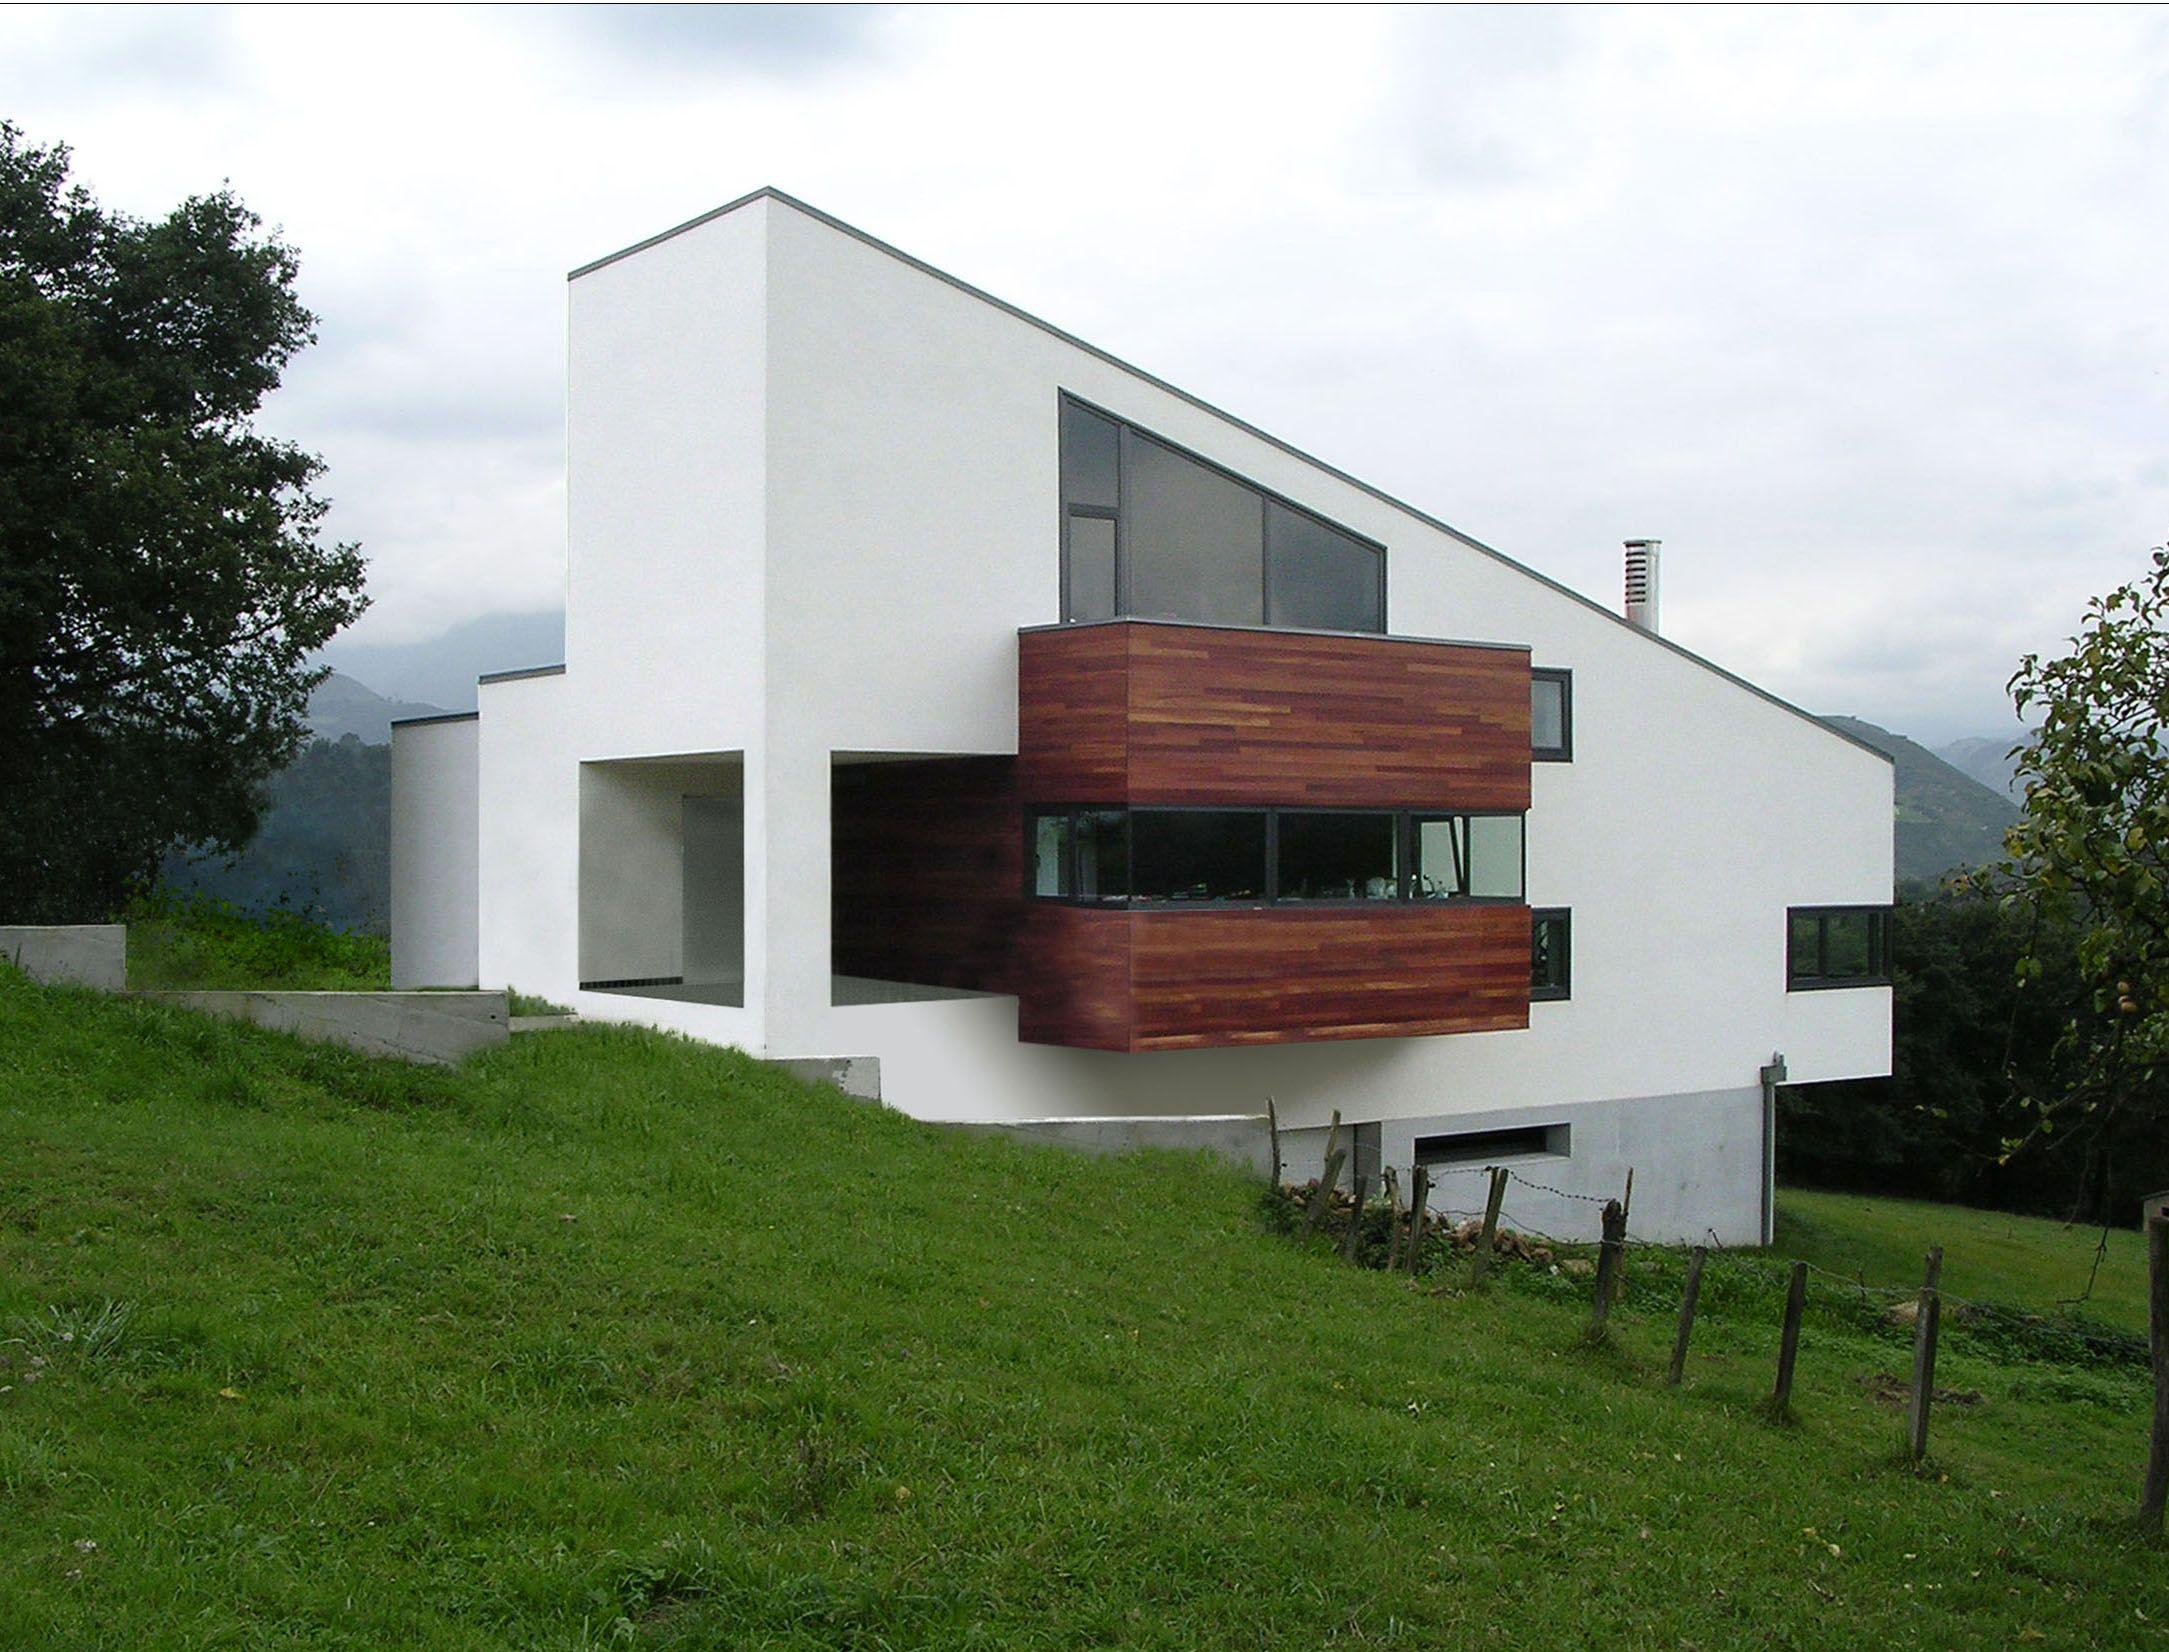 #Edificios #Contemporaneo #Exterior #Dibujos #Ventanas #Fachada #Vidrio